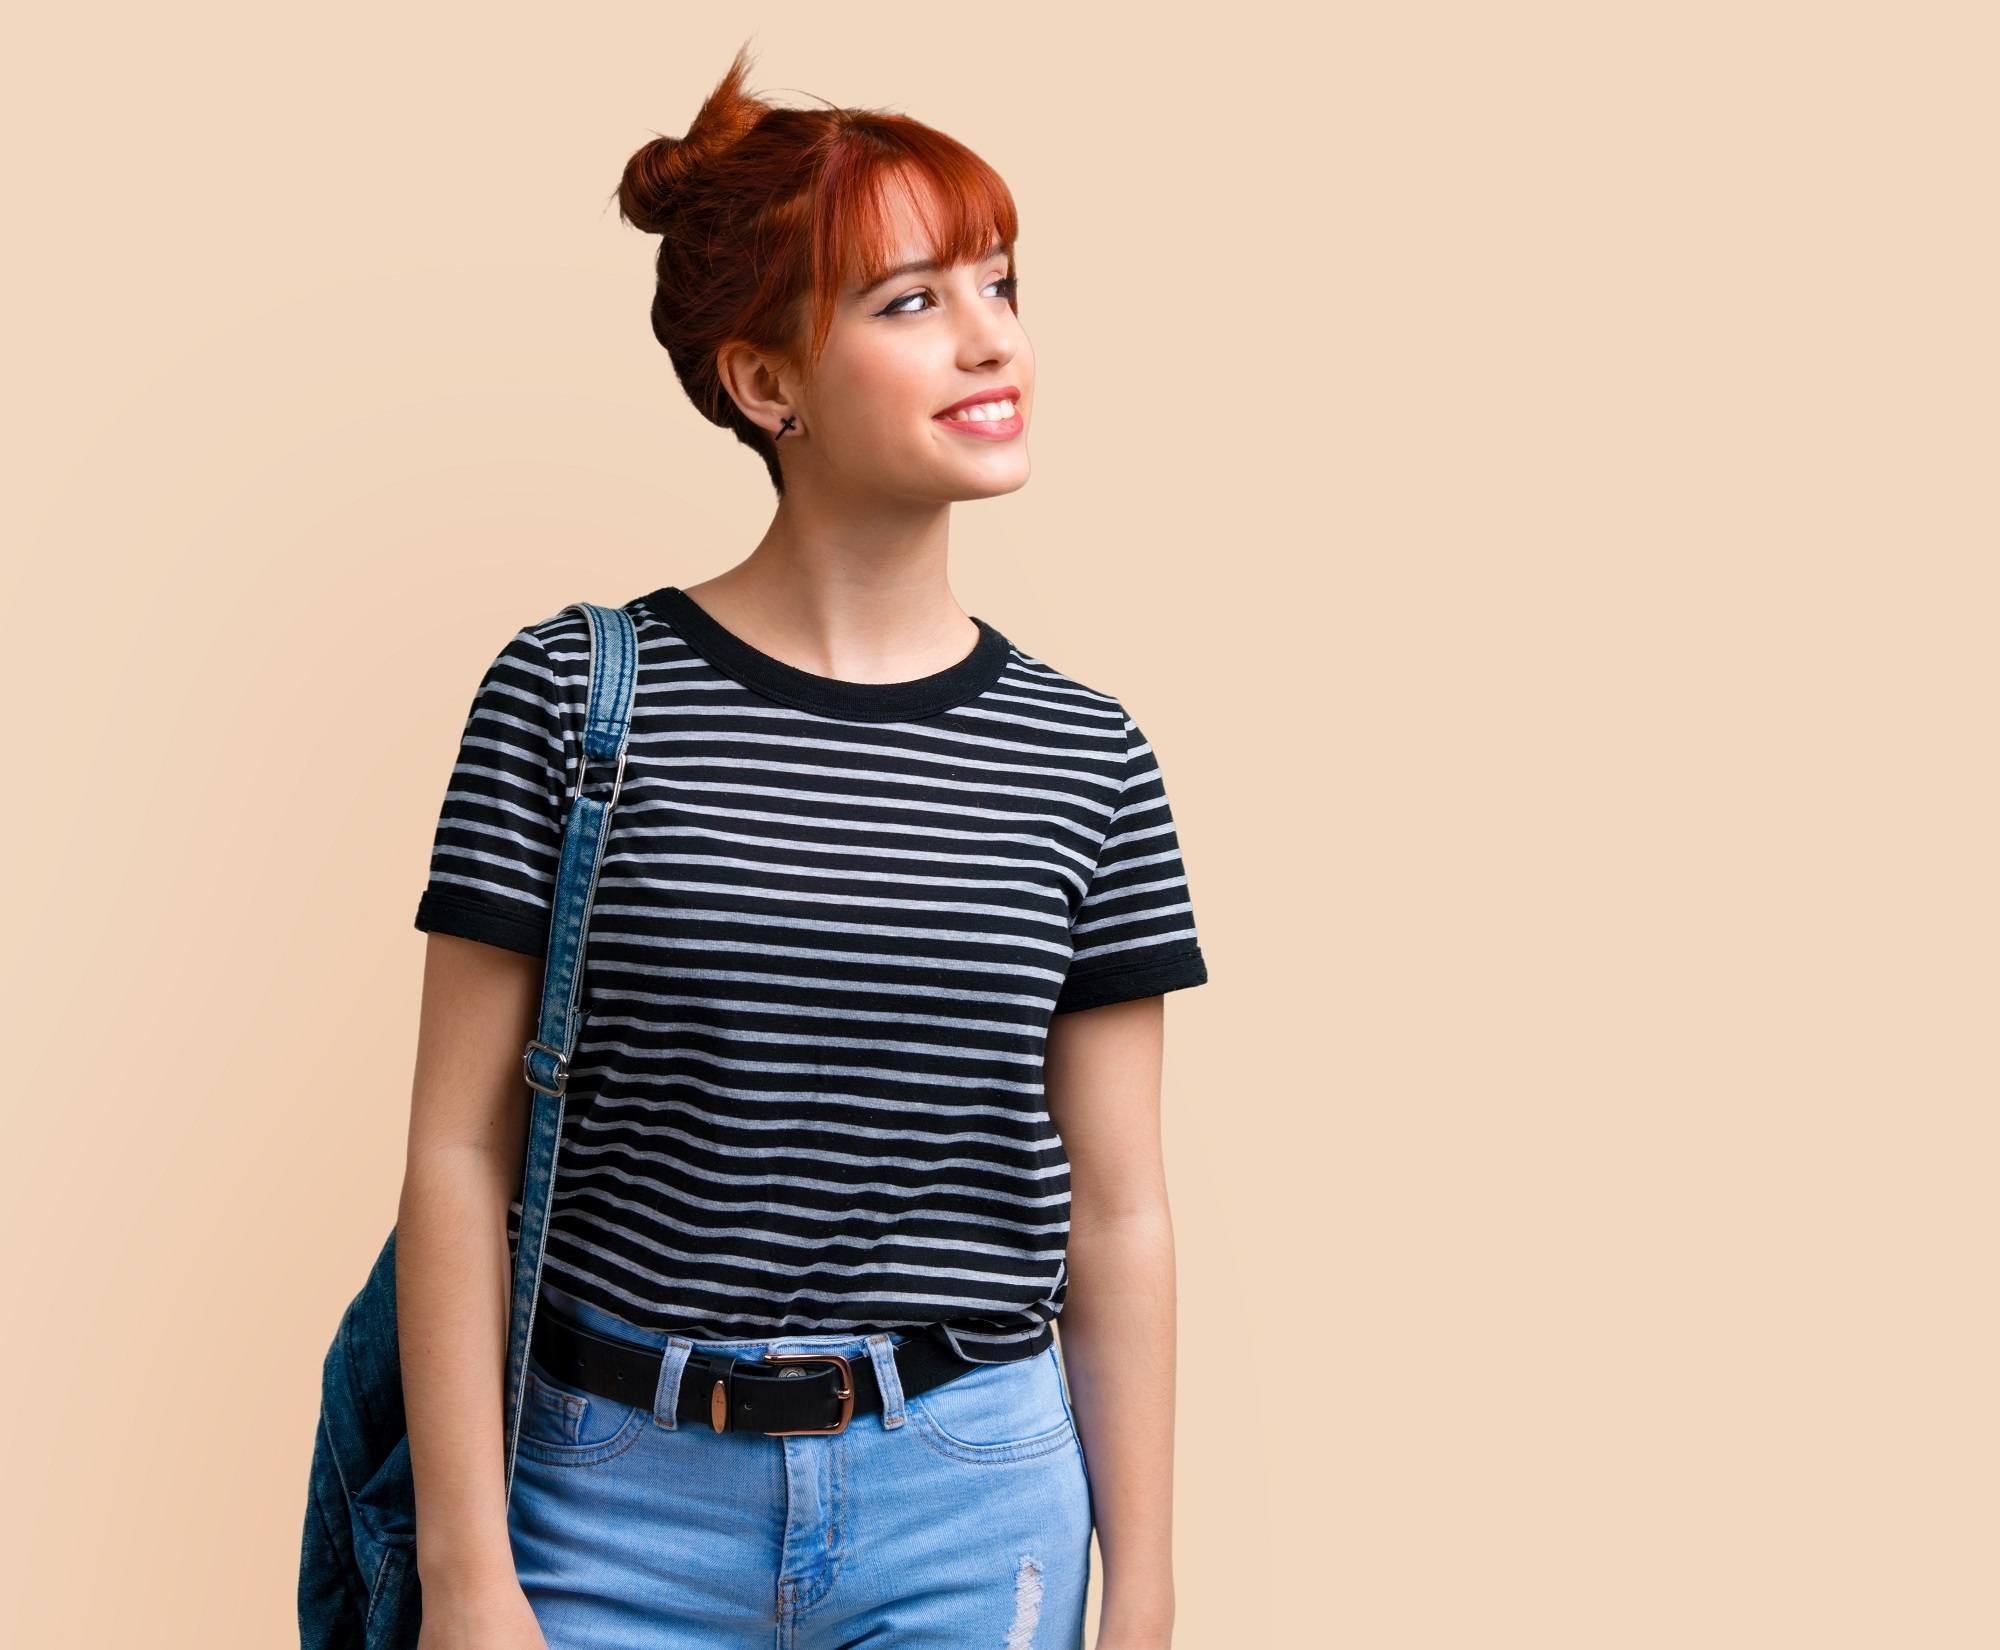 School hairstyles that won't make you look nene: Ballerina bun